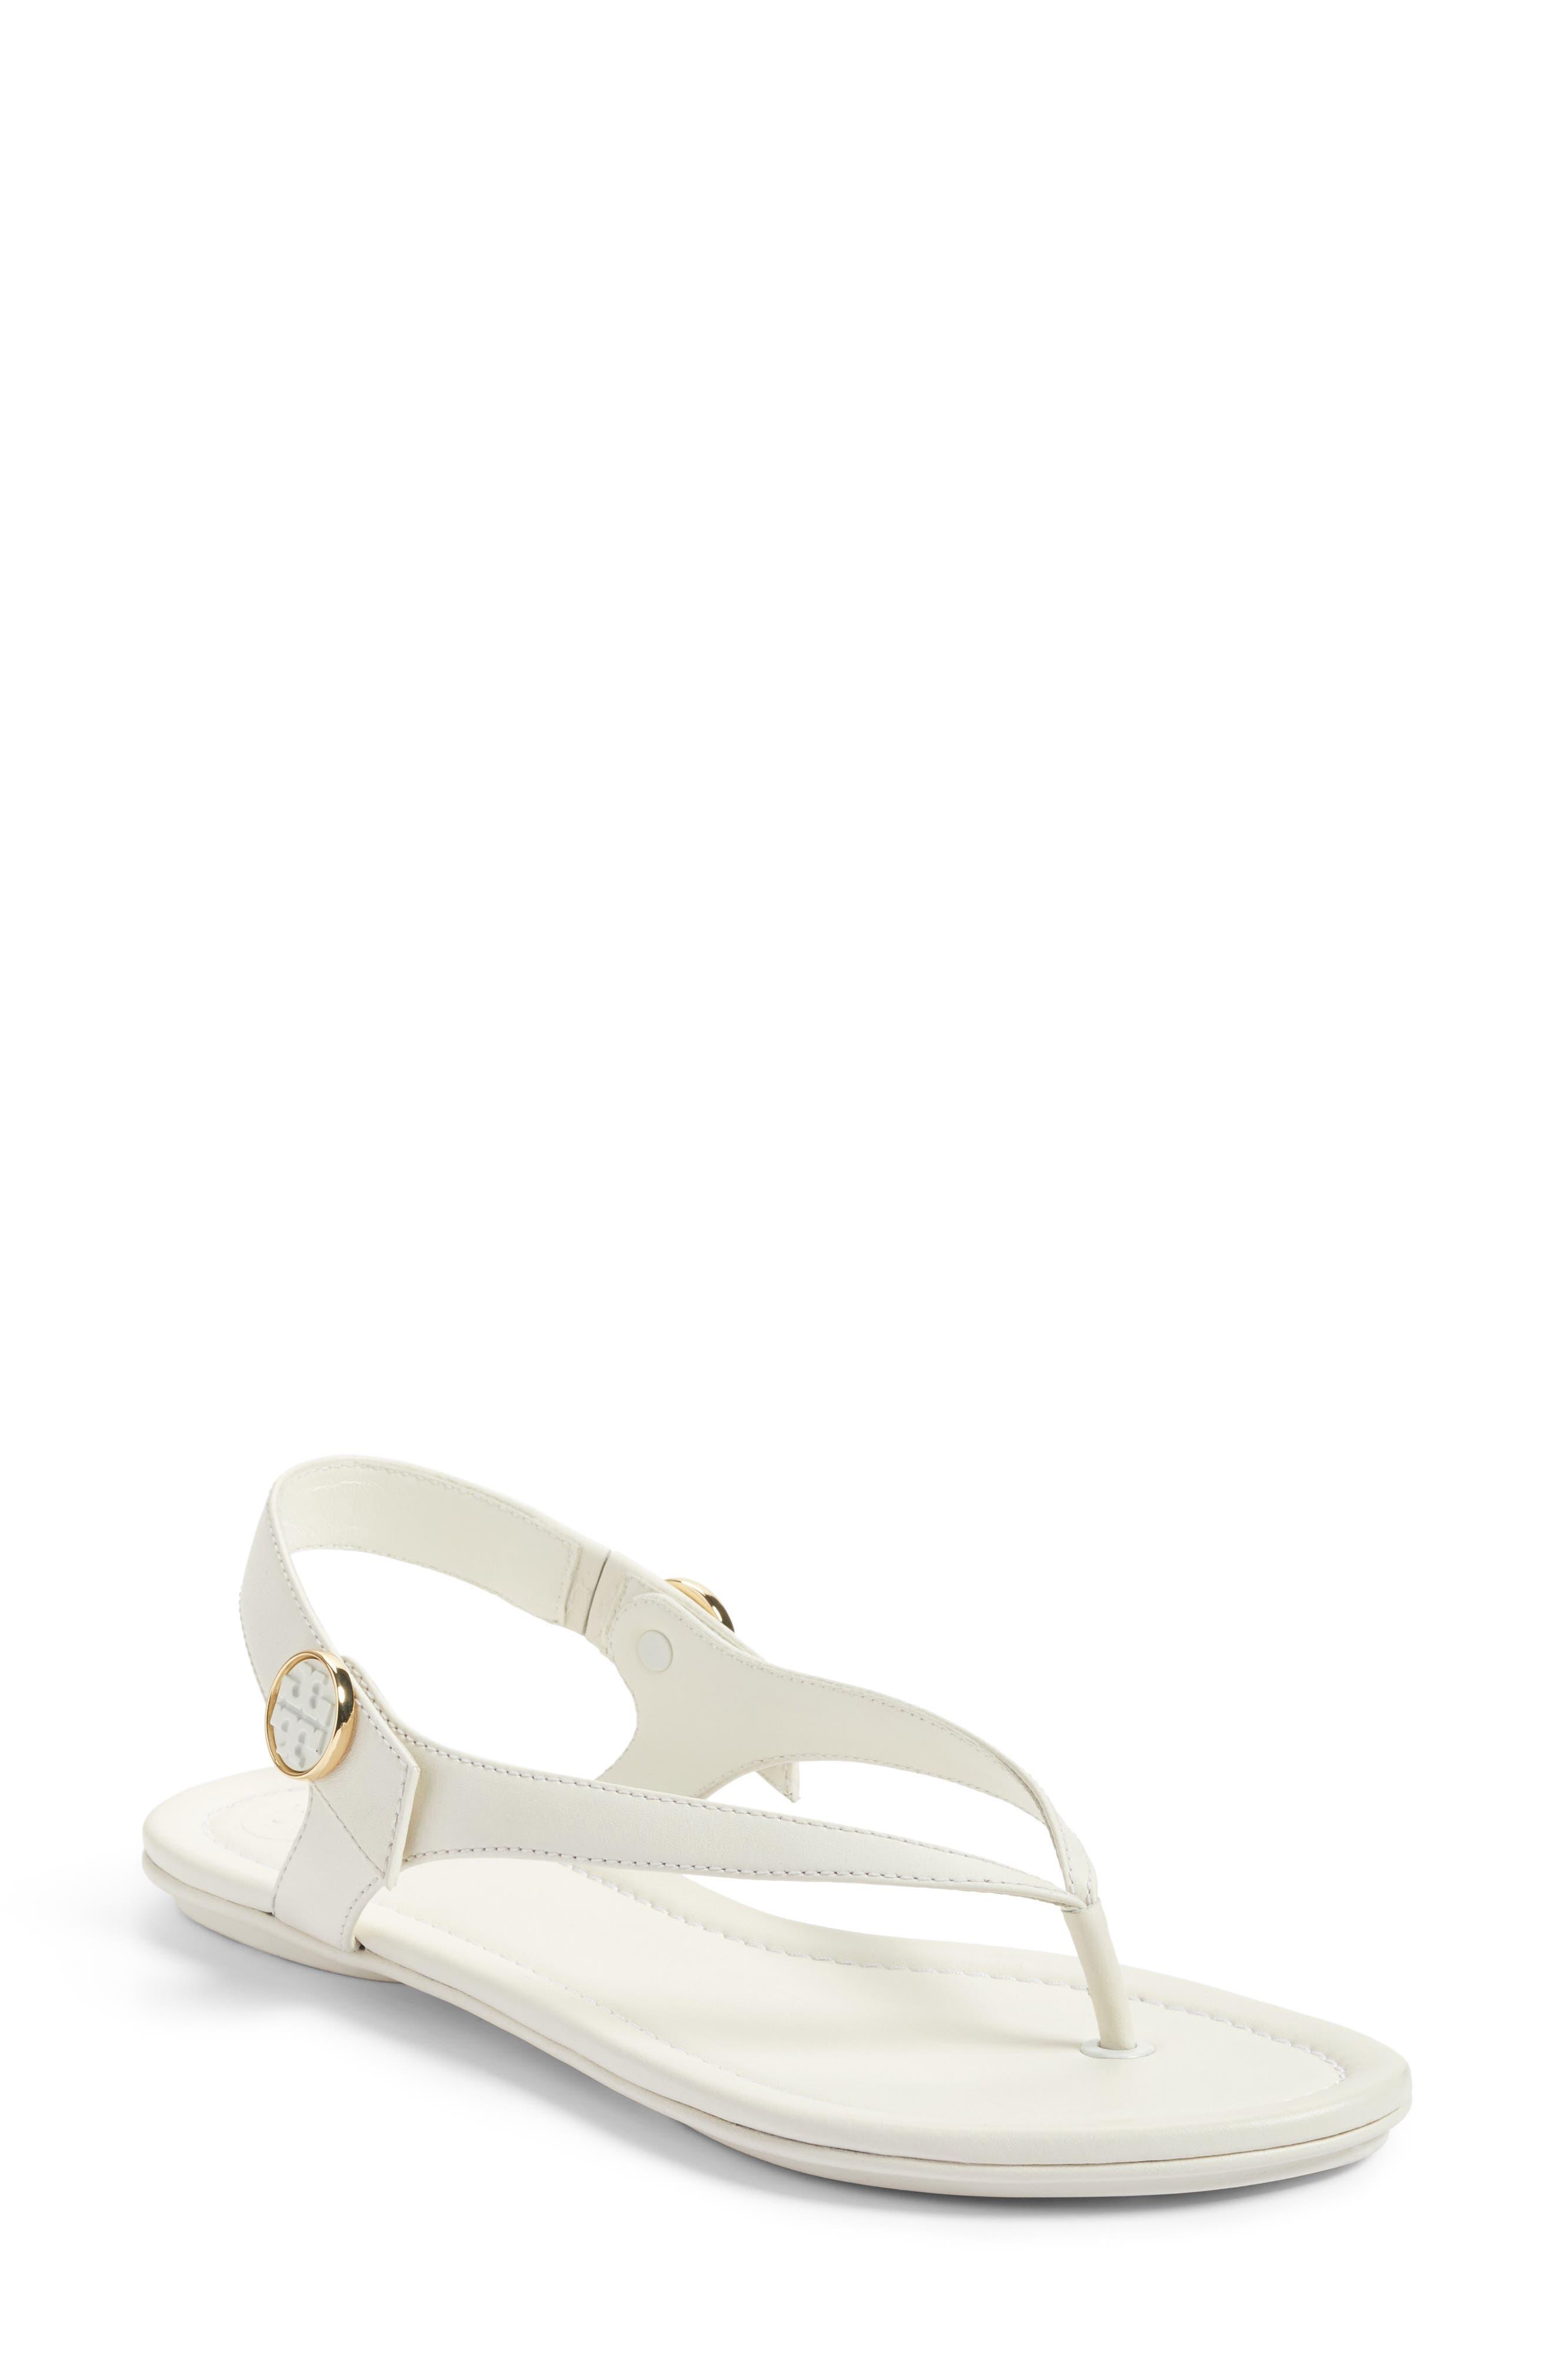 Tory Burch Minnie Travel Thong Sandal (Women)